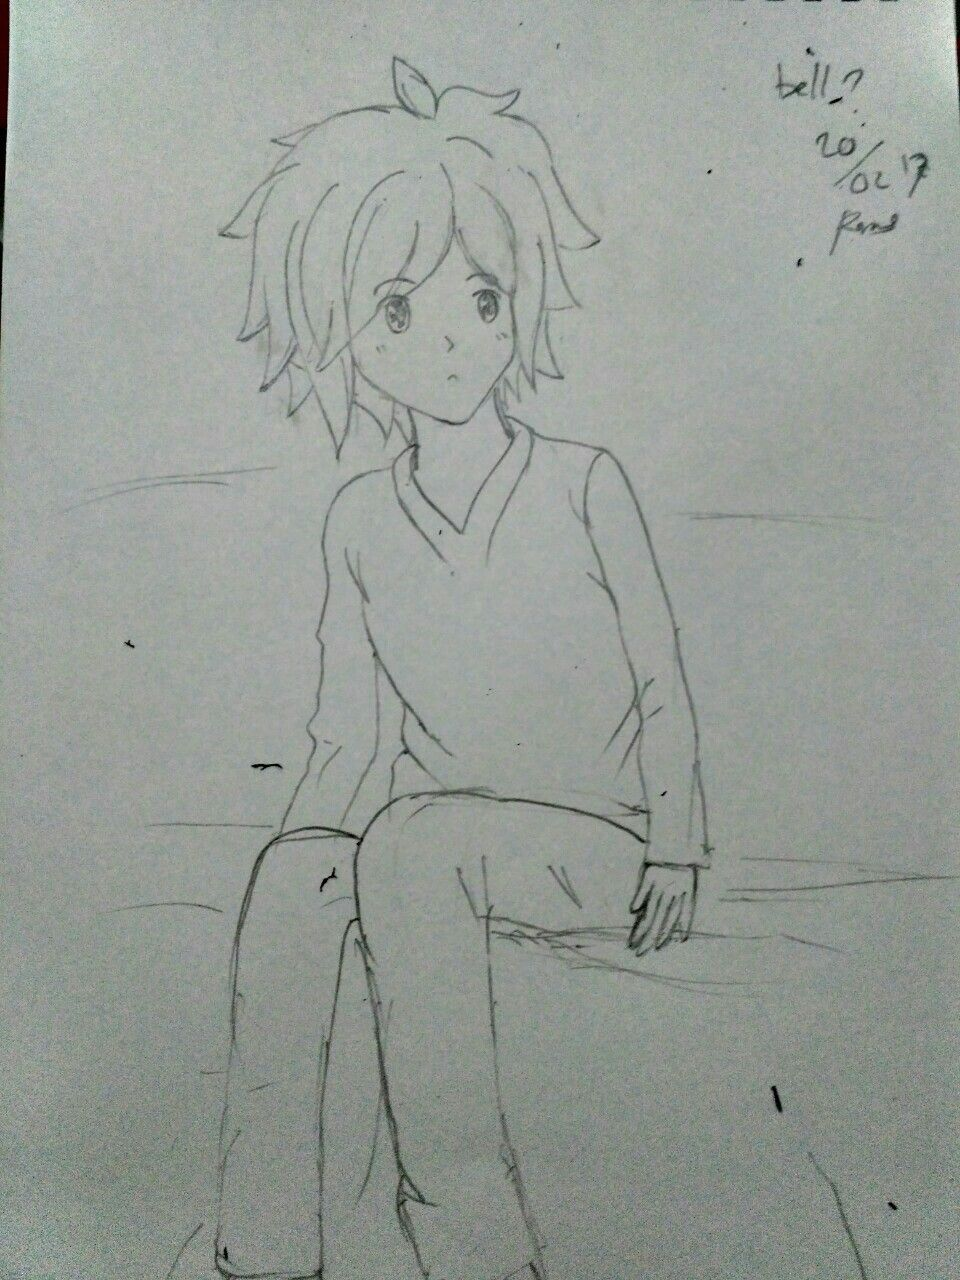 Iseng iseng gambar bell sketsa anime leveon bell belle